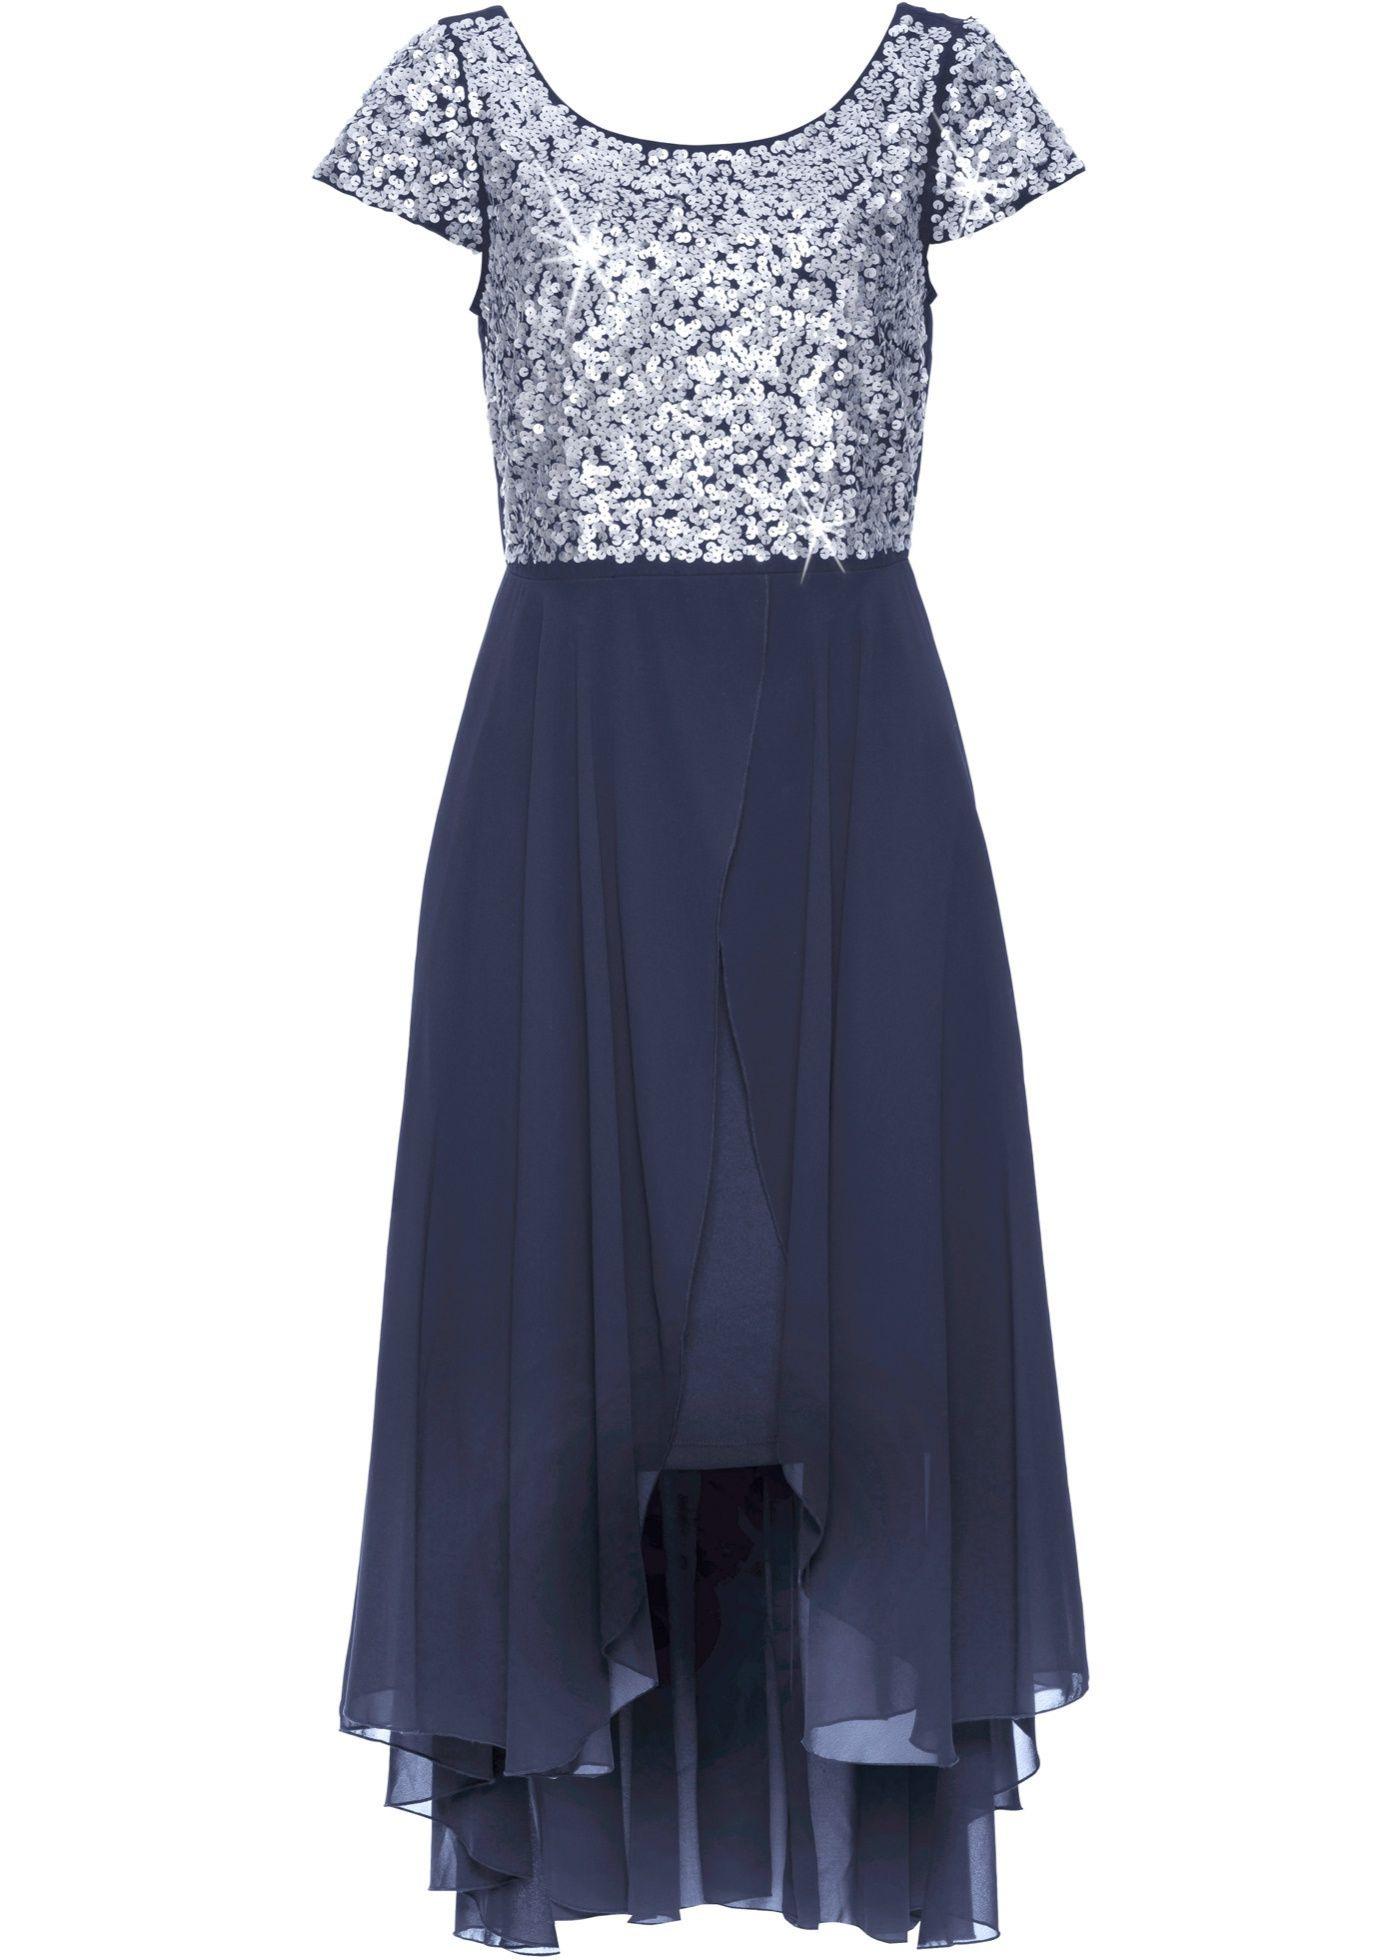 17 Fantastisch Abend-Vokuhila-Kleid Boutique10 Cool Abend-Vokuhila-Kleid Vertrieb